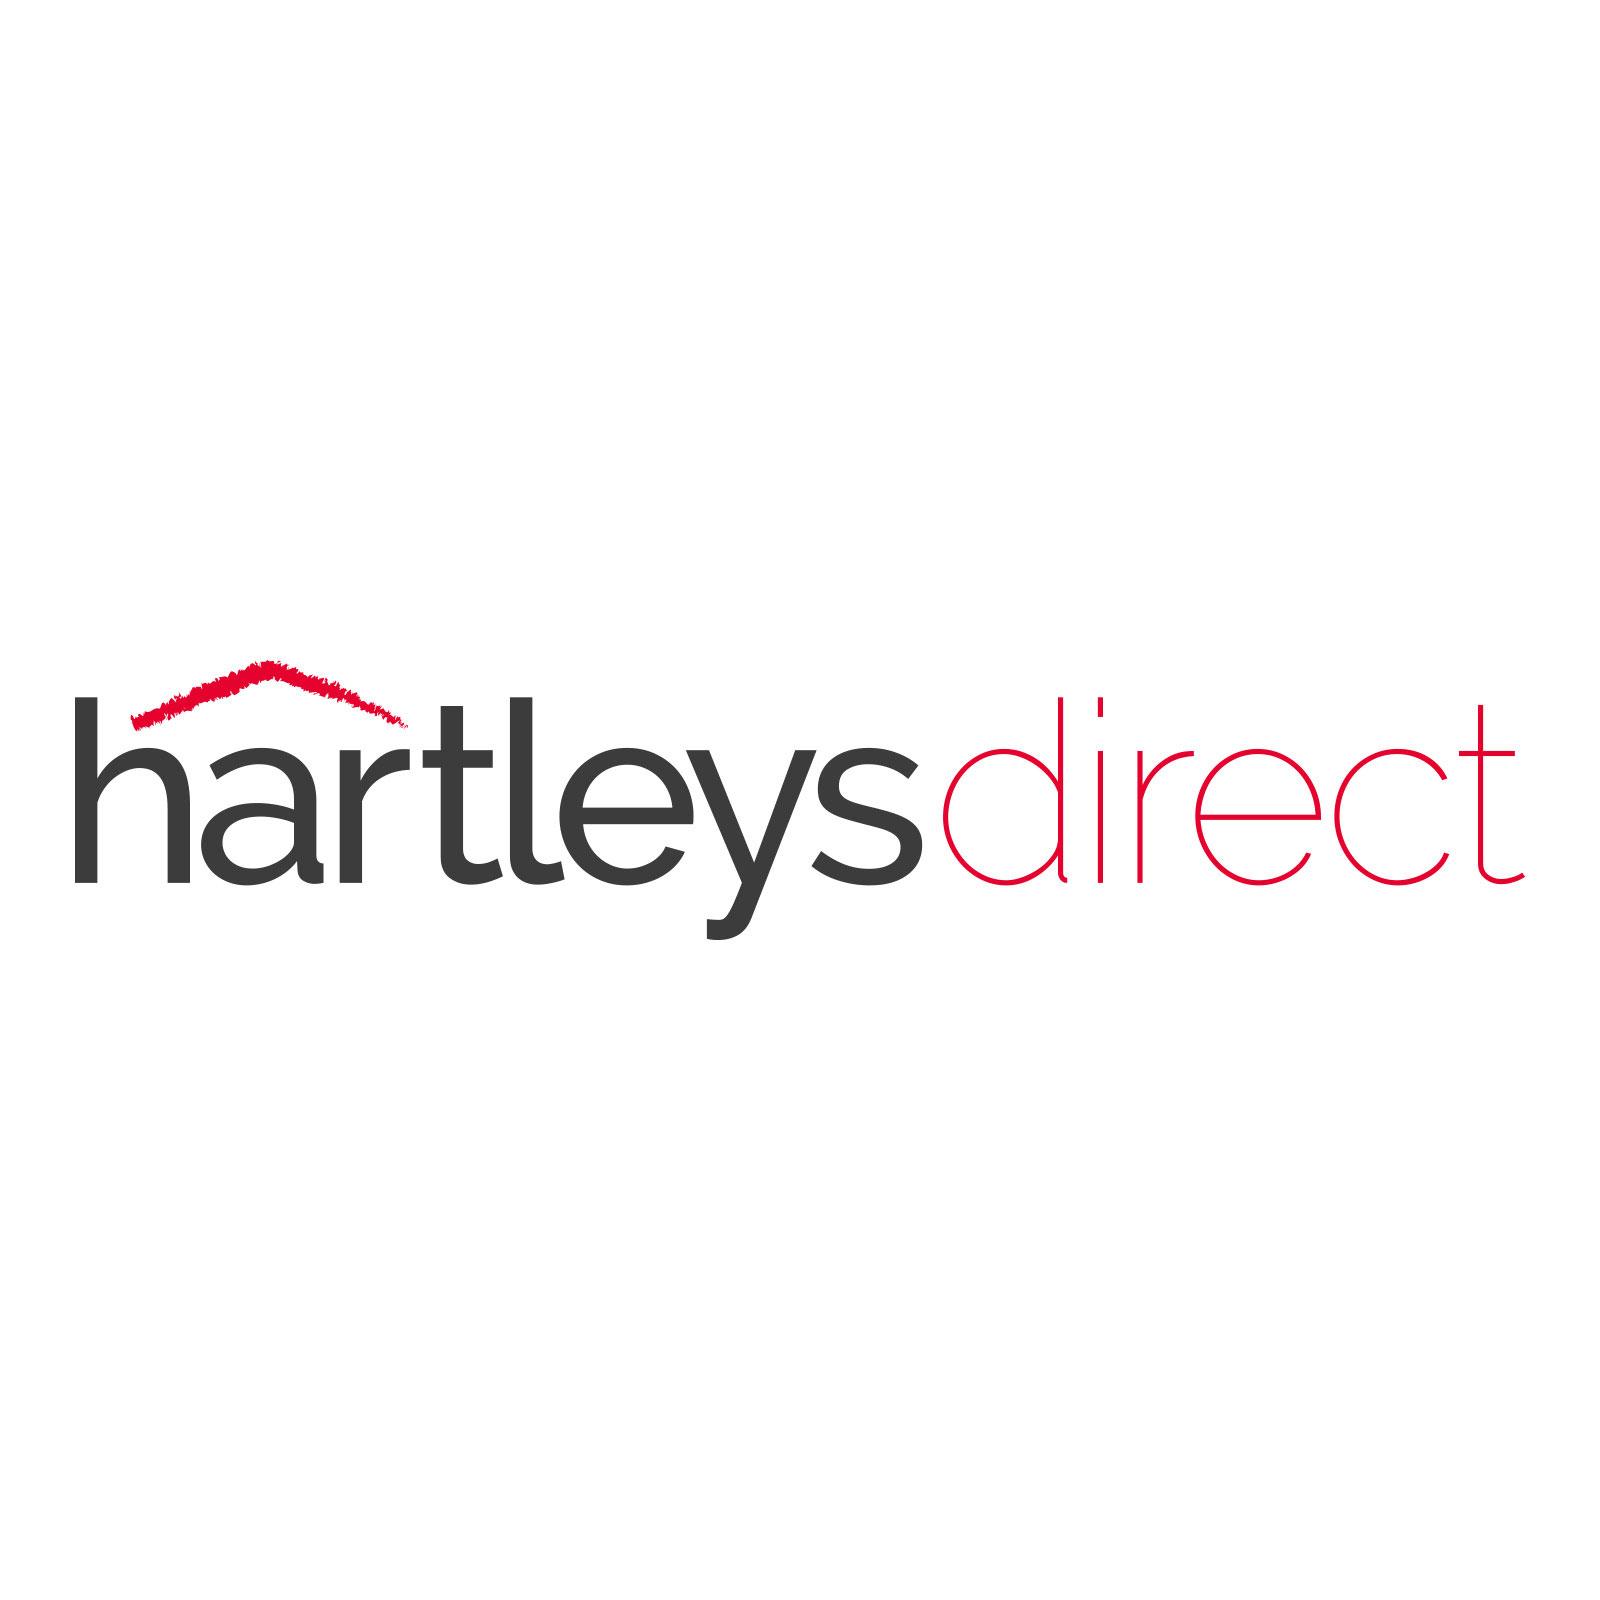 Hartleys-Black-Industrial-Double-Cross-Table-Legs-on-White-Background.jpg